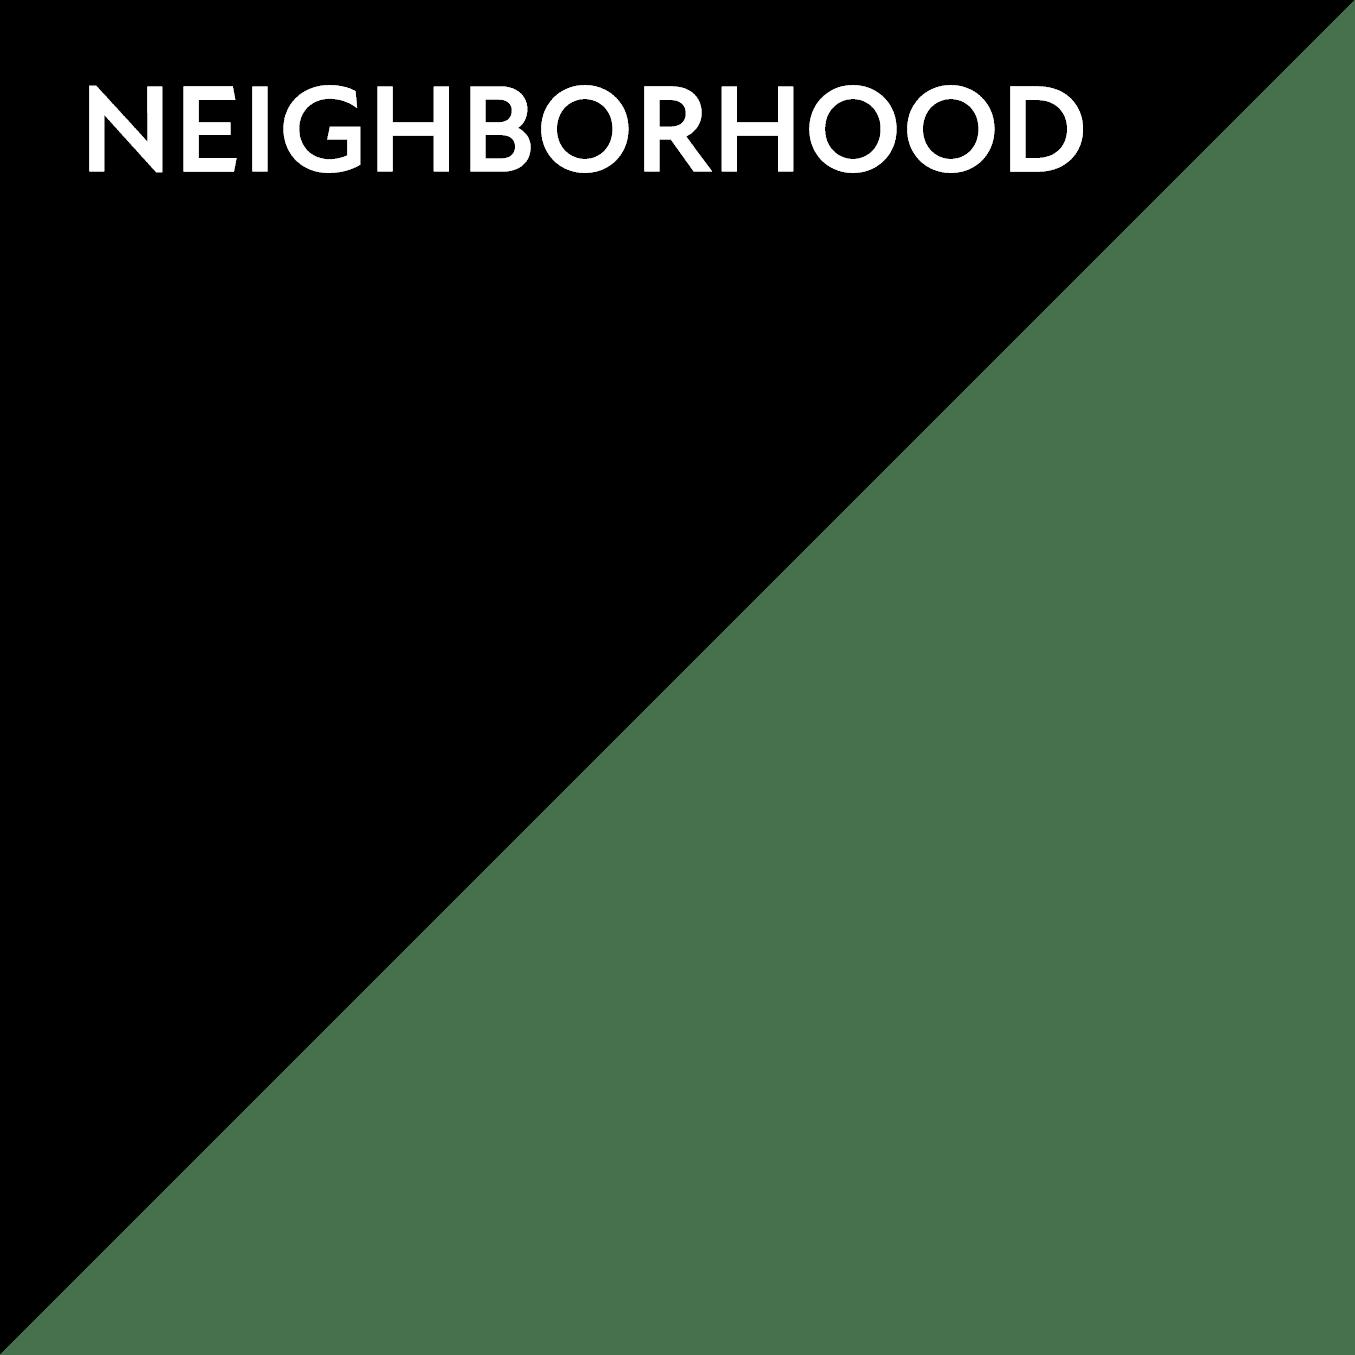 Link to neighborhood page of Avenue @Creekbridge in Brandon, Florida